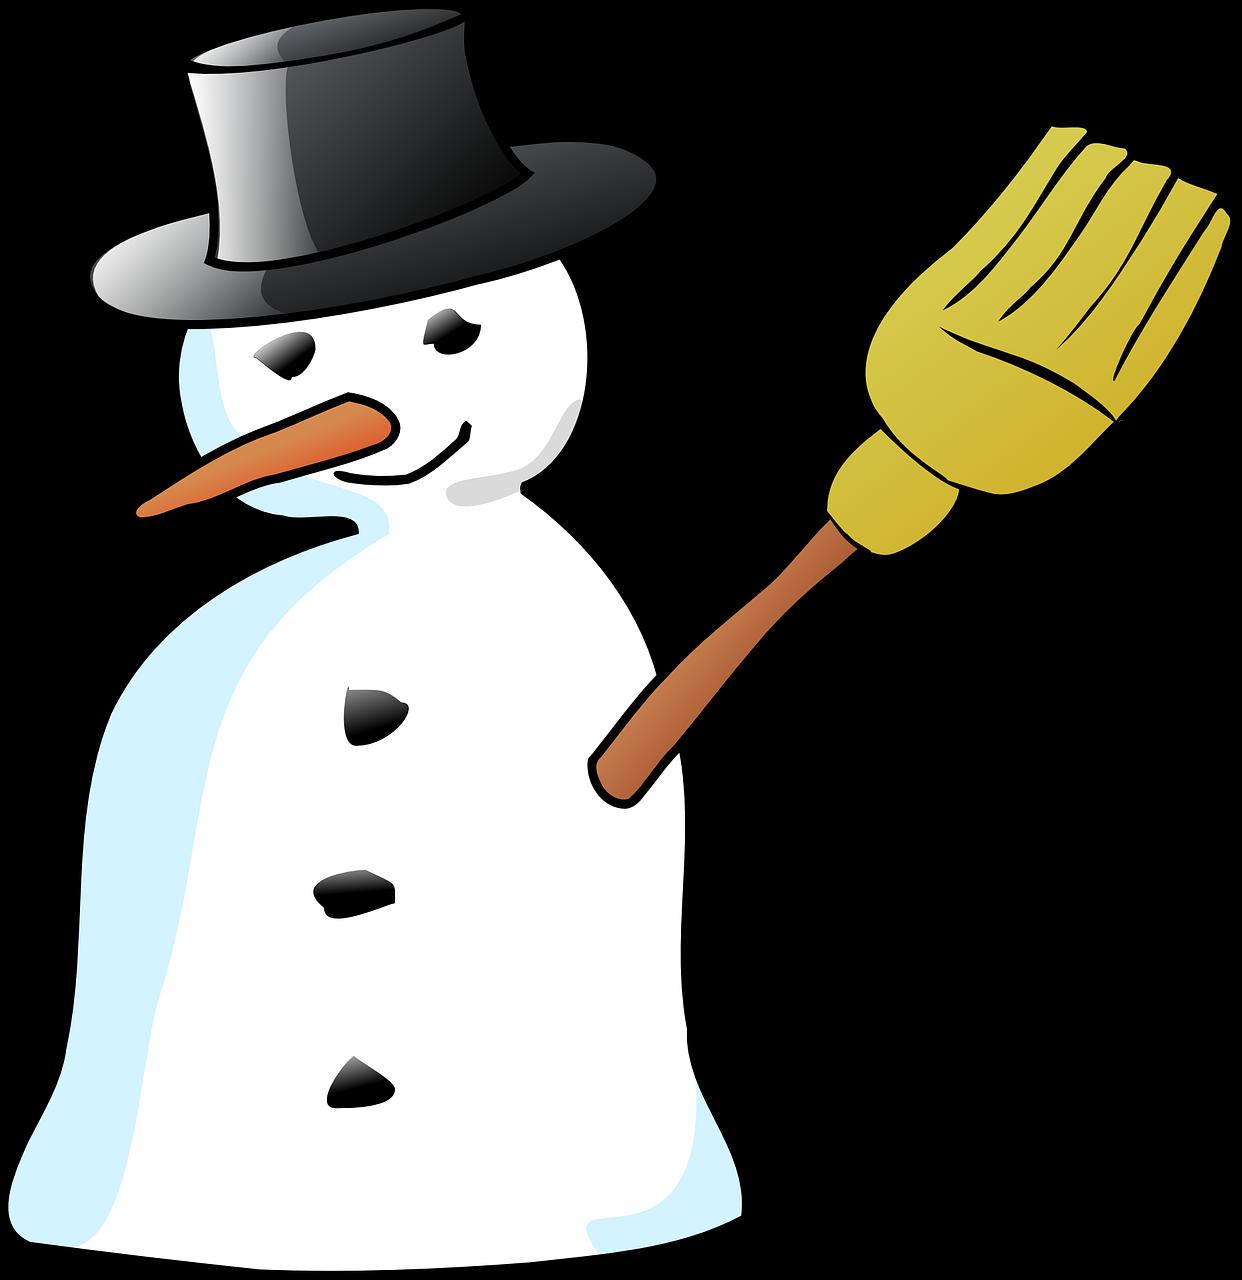 vector download Broom clipart snowman. Hat carrot stick transparent